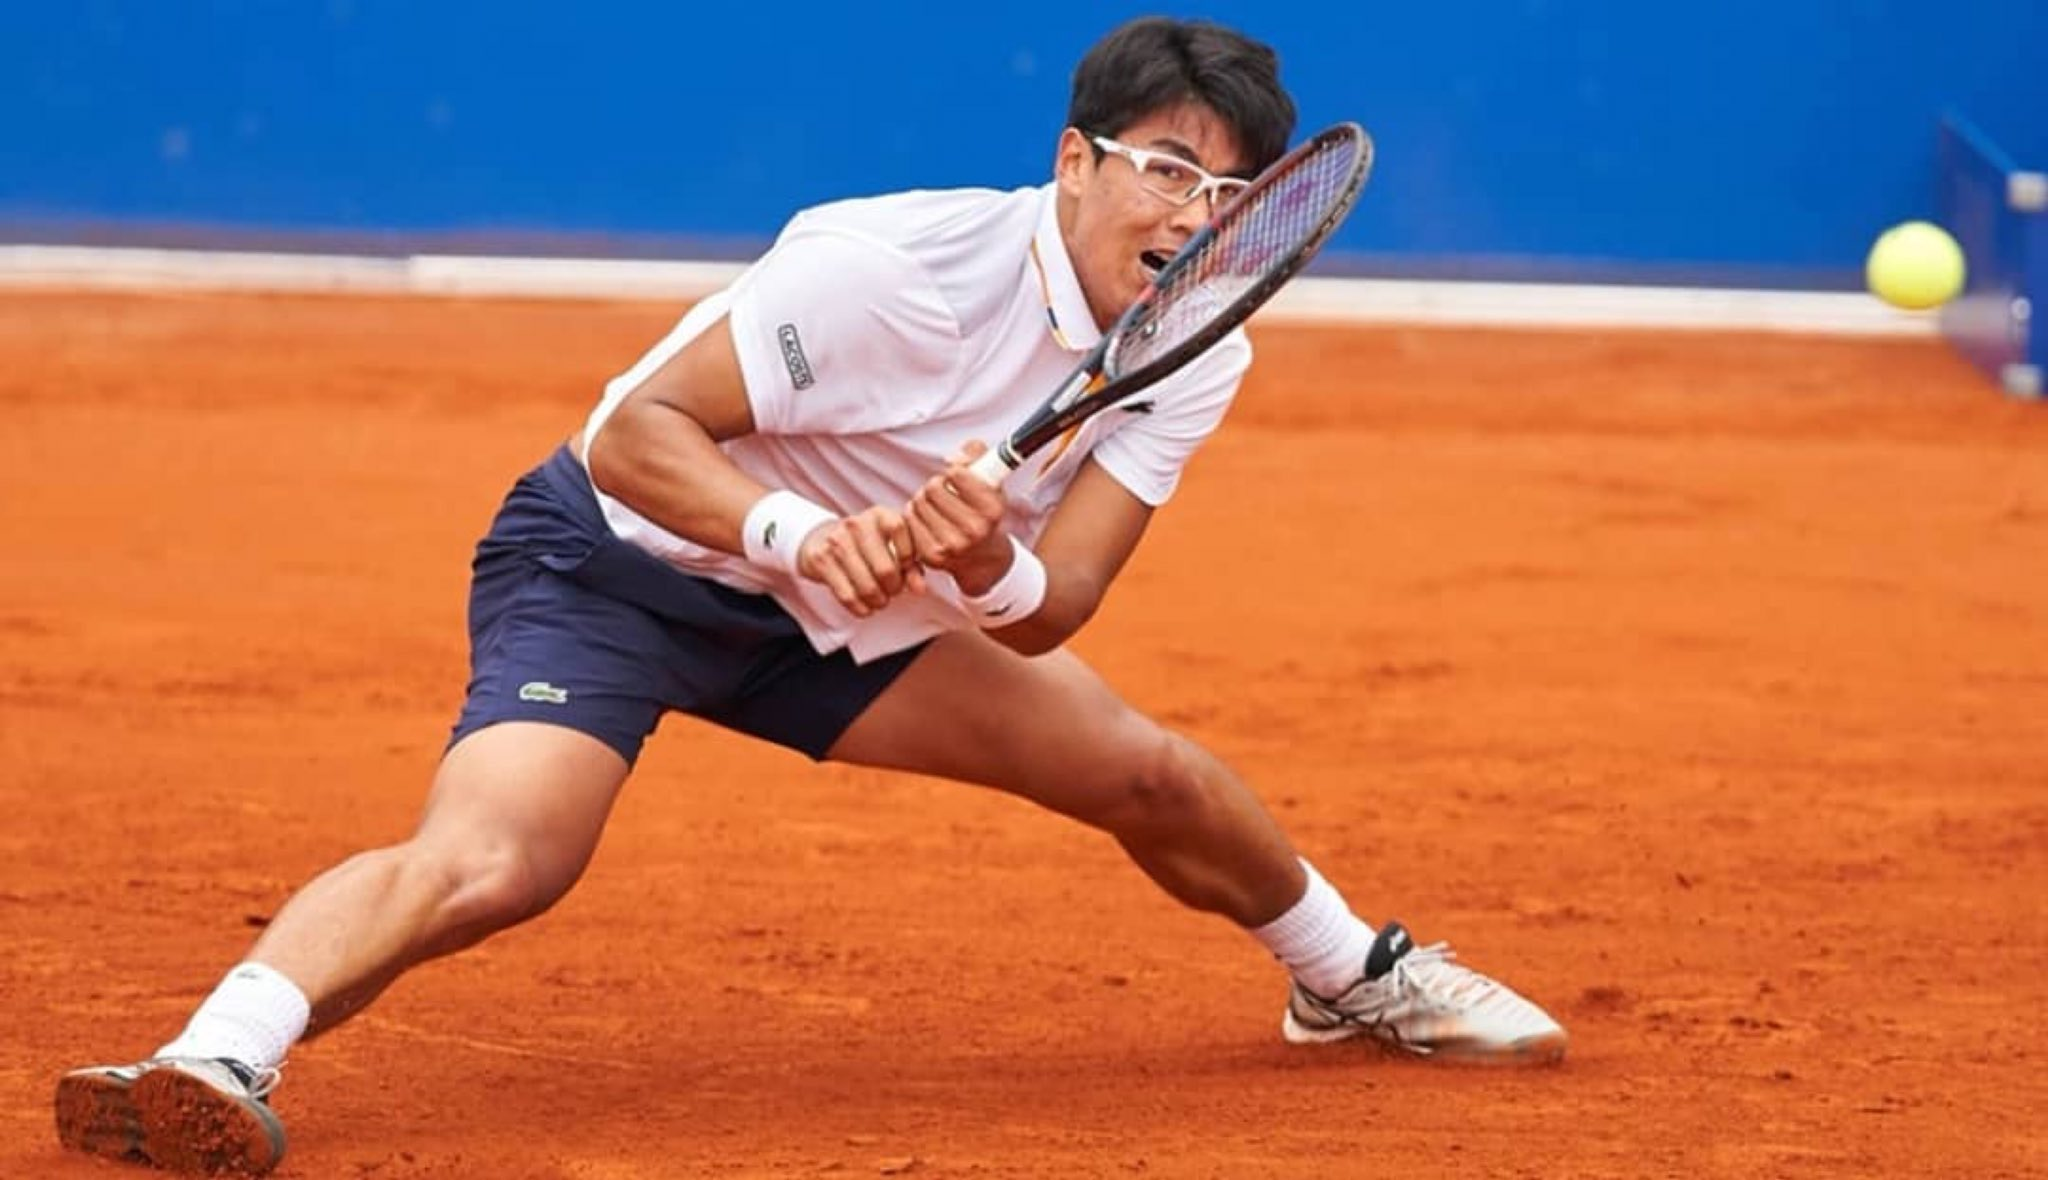 hyeon chung asics tennis shoes 2018